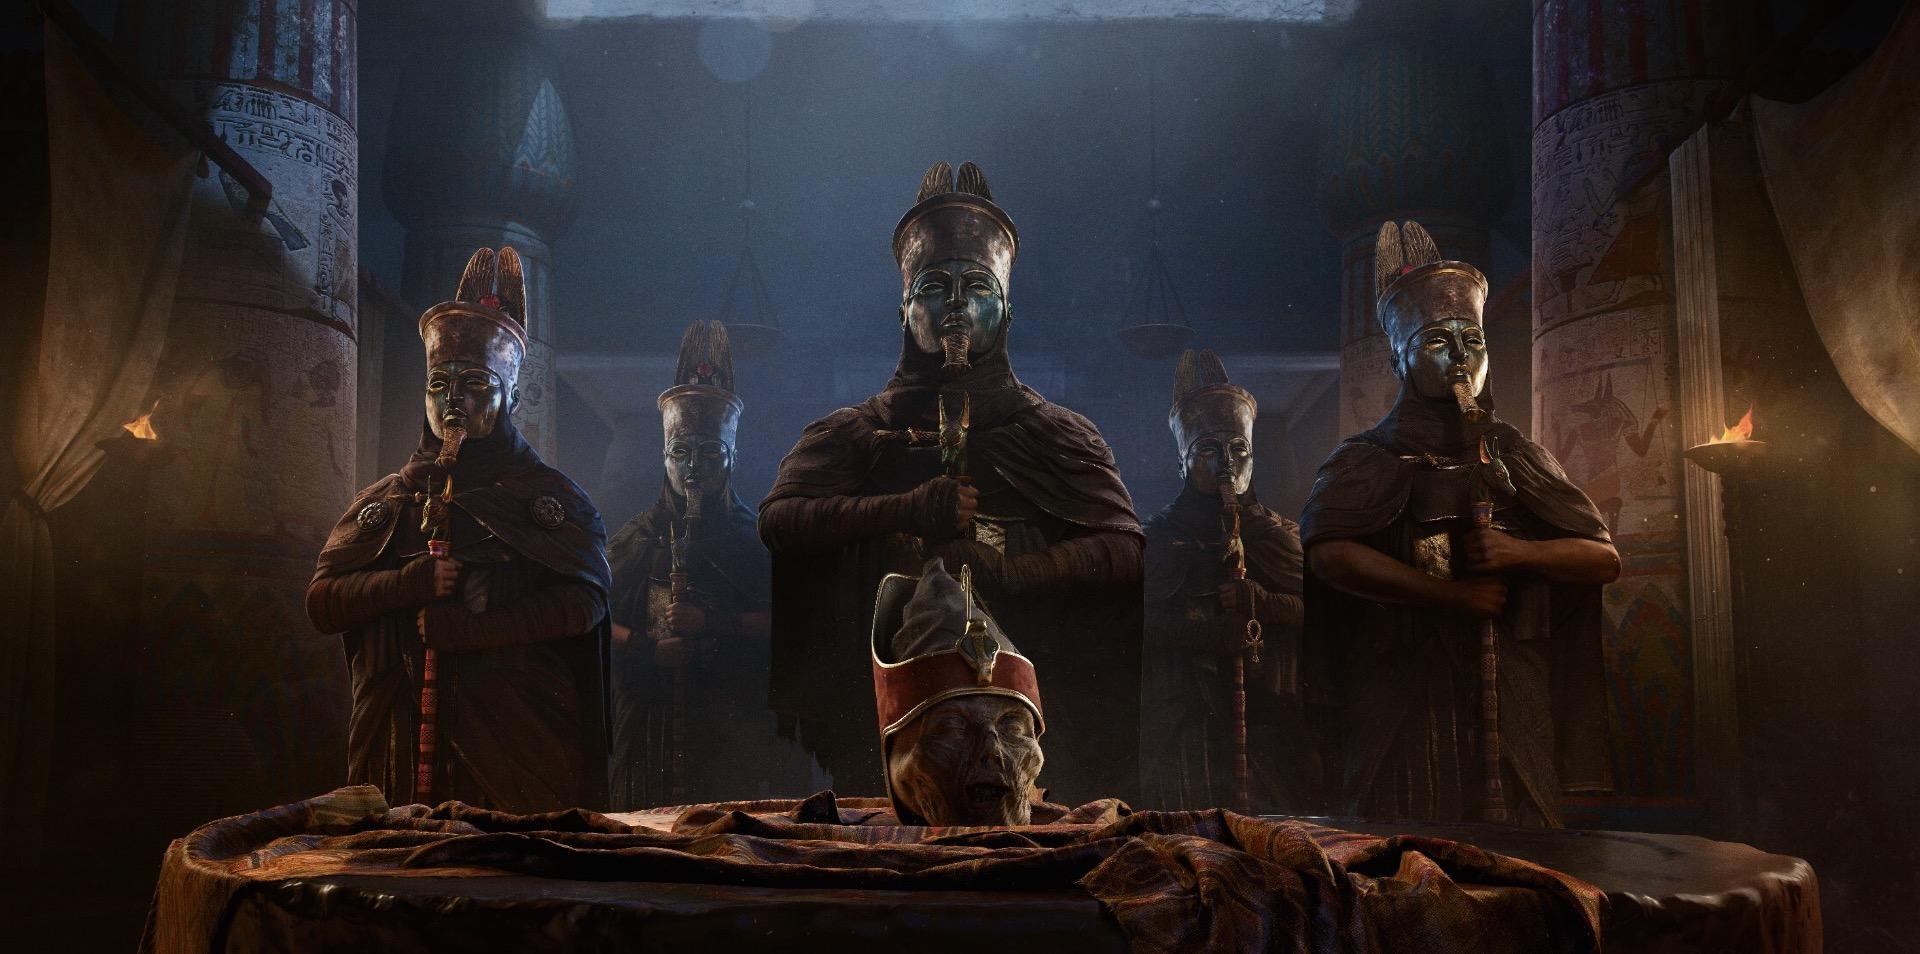 2bdc4_assassins-creed-origins.jpg